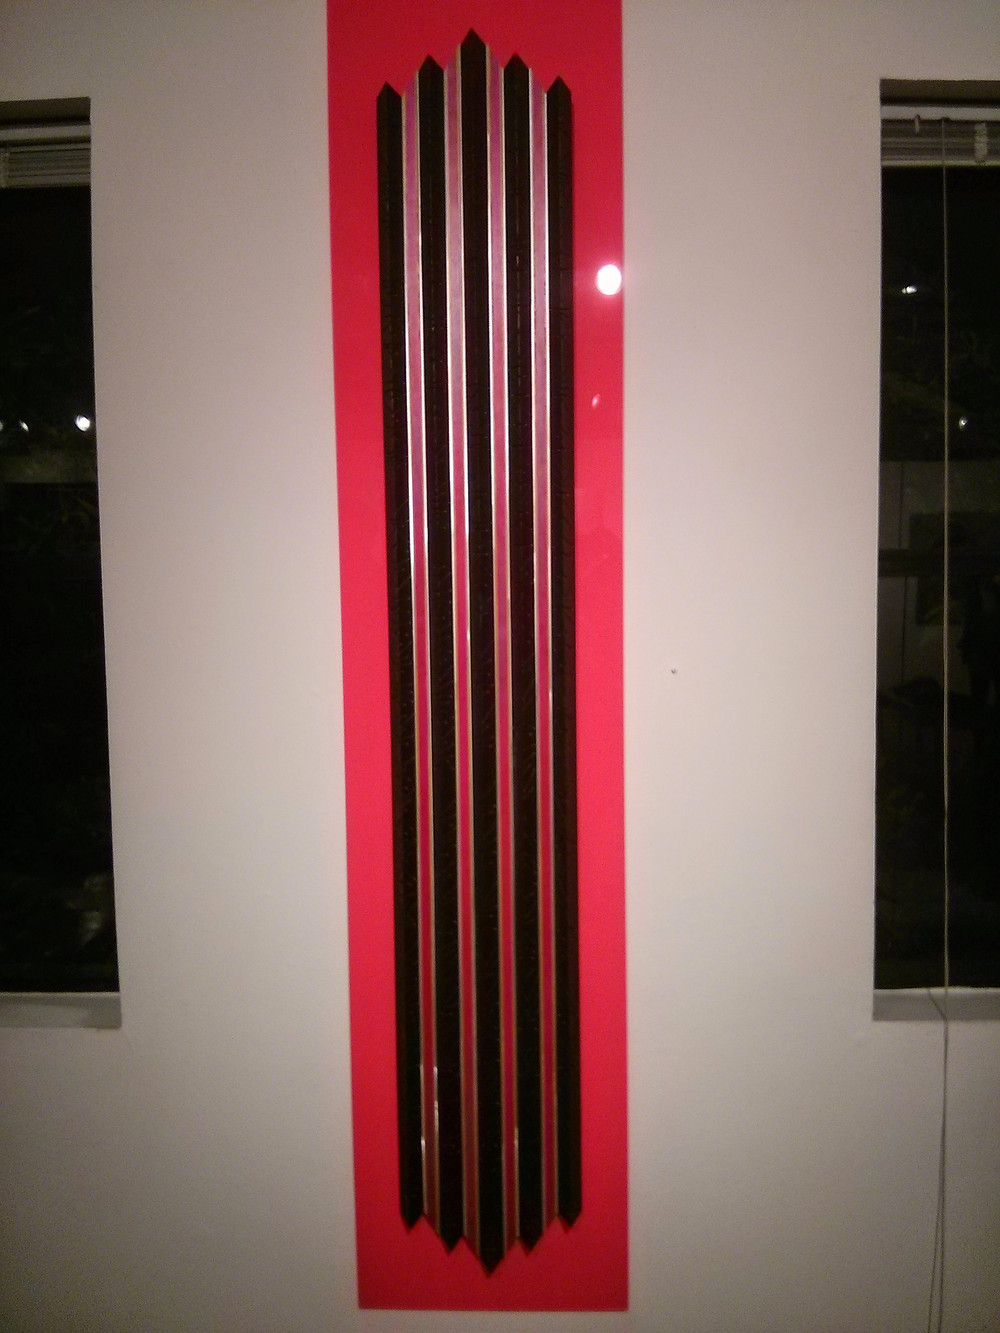 Alex Garcia; a.Muse Gallery